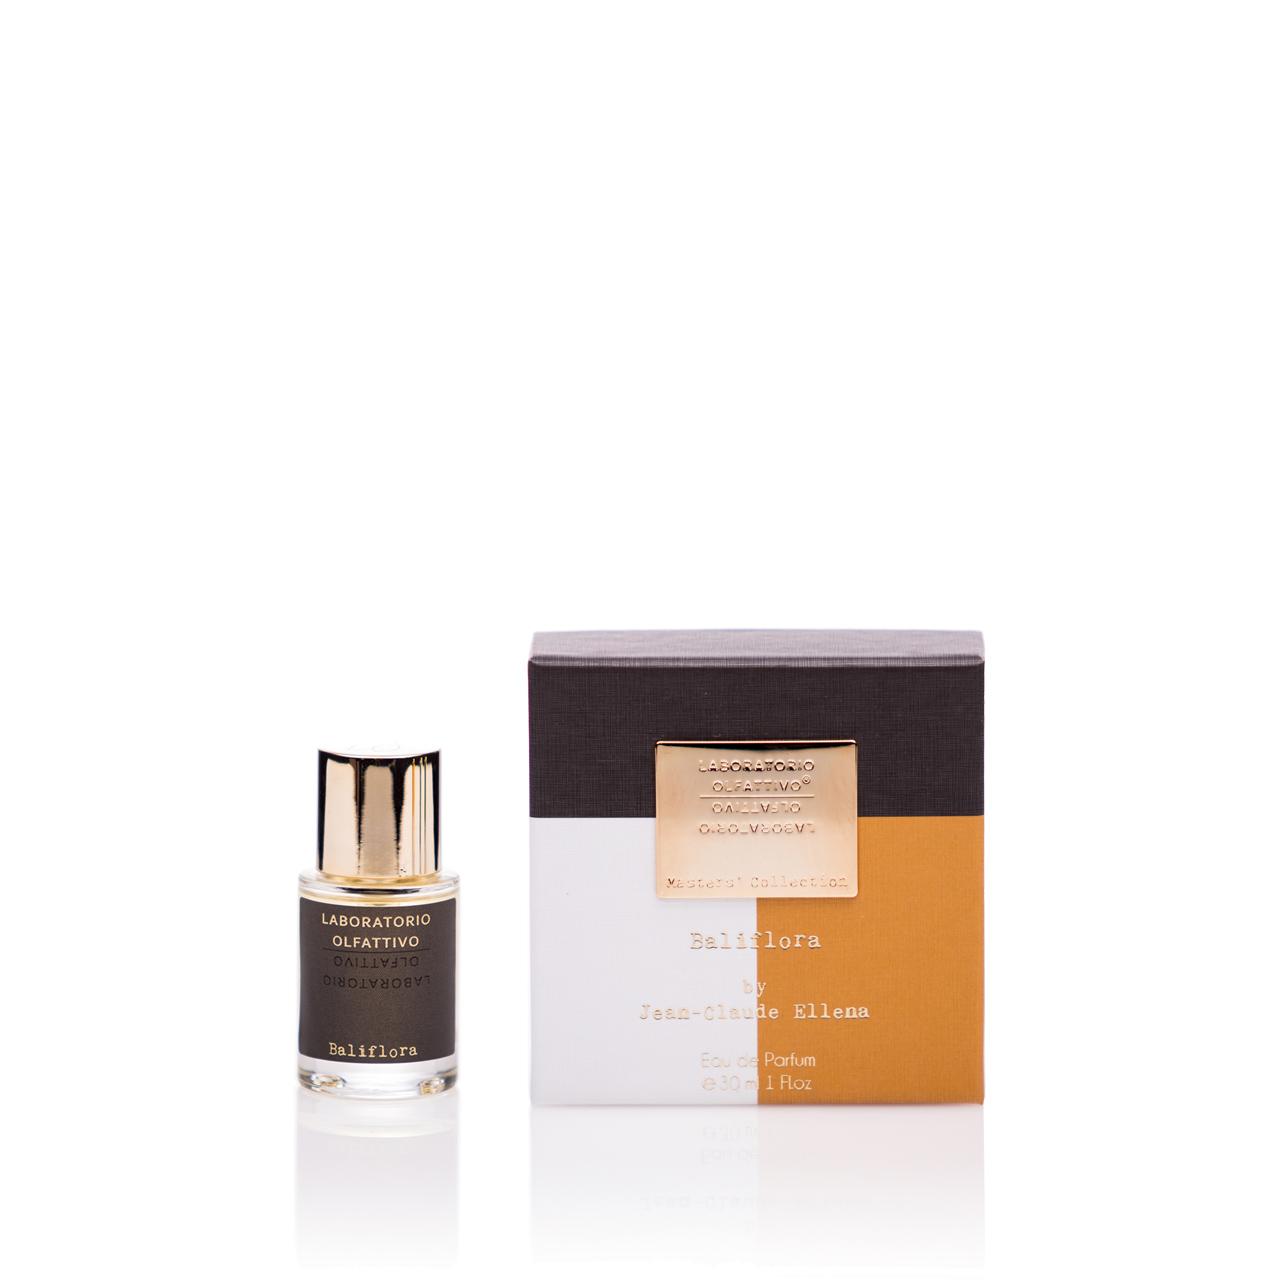 Baliflora - Eau de Parfum